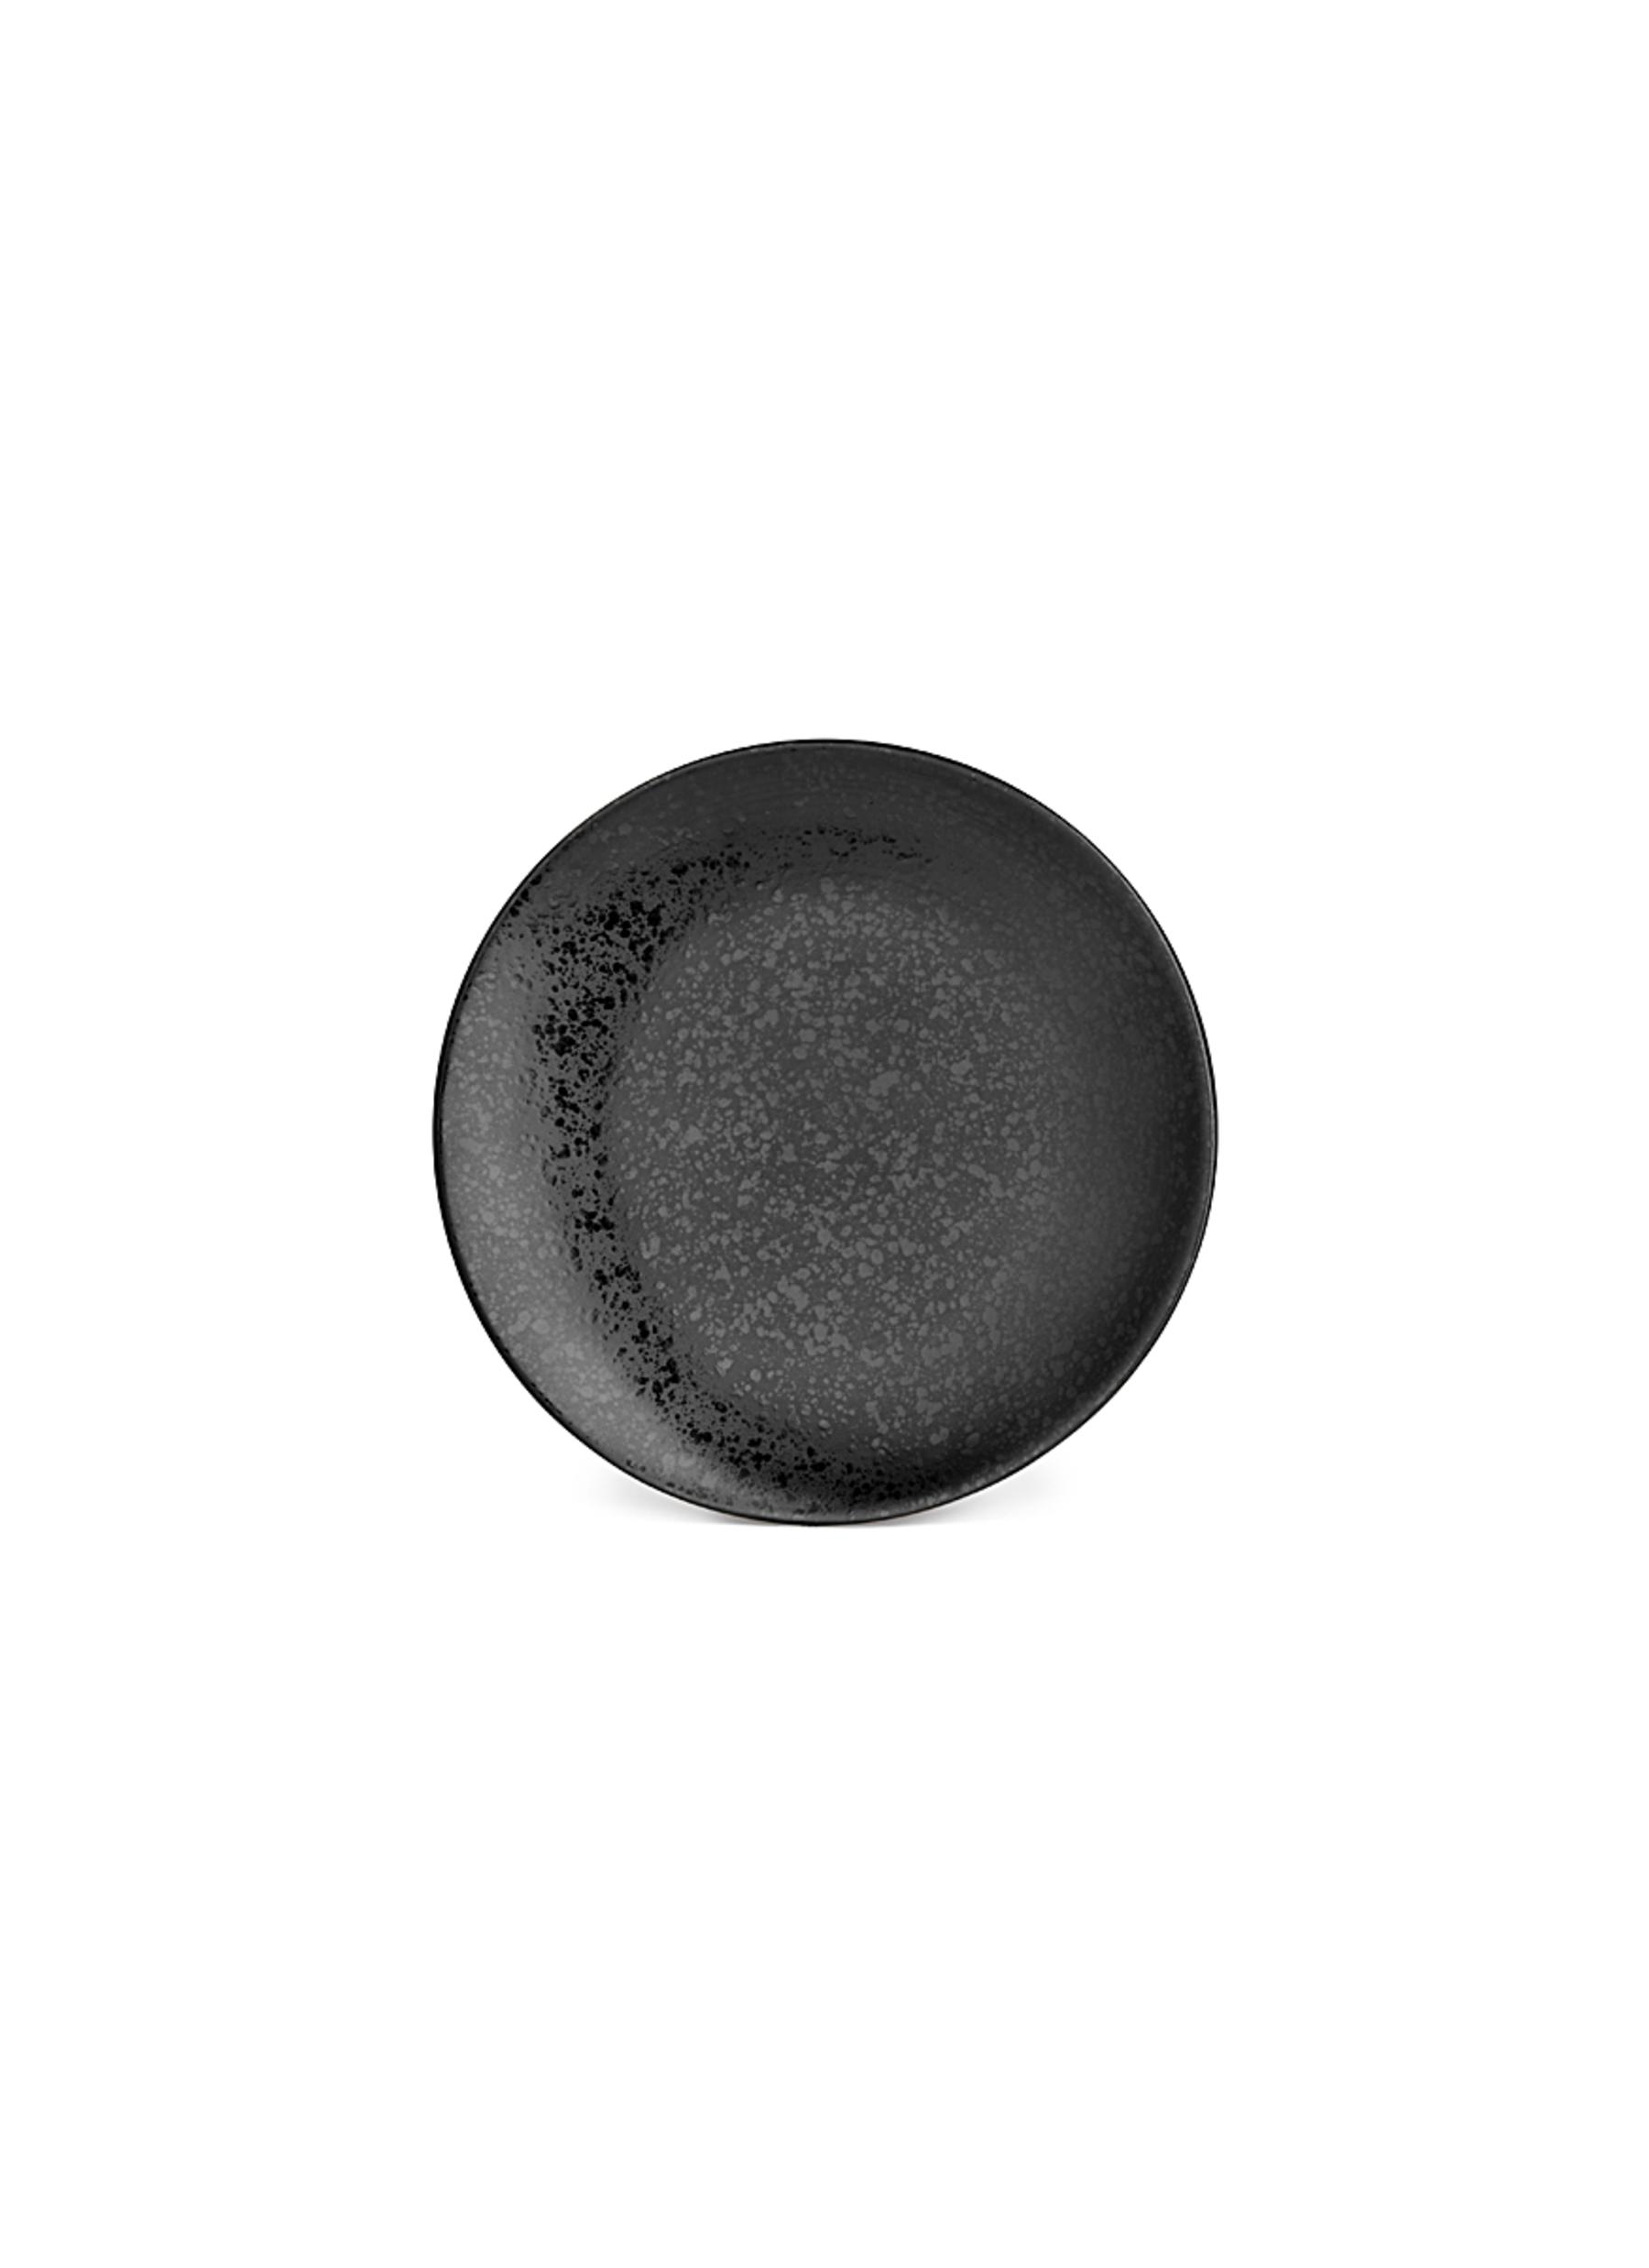 lobjet female alchimie dessert plate black